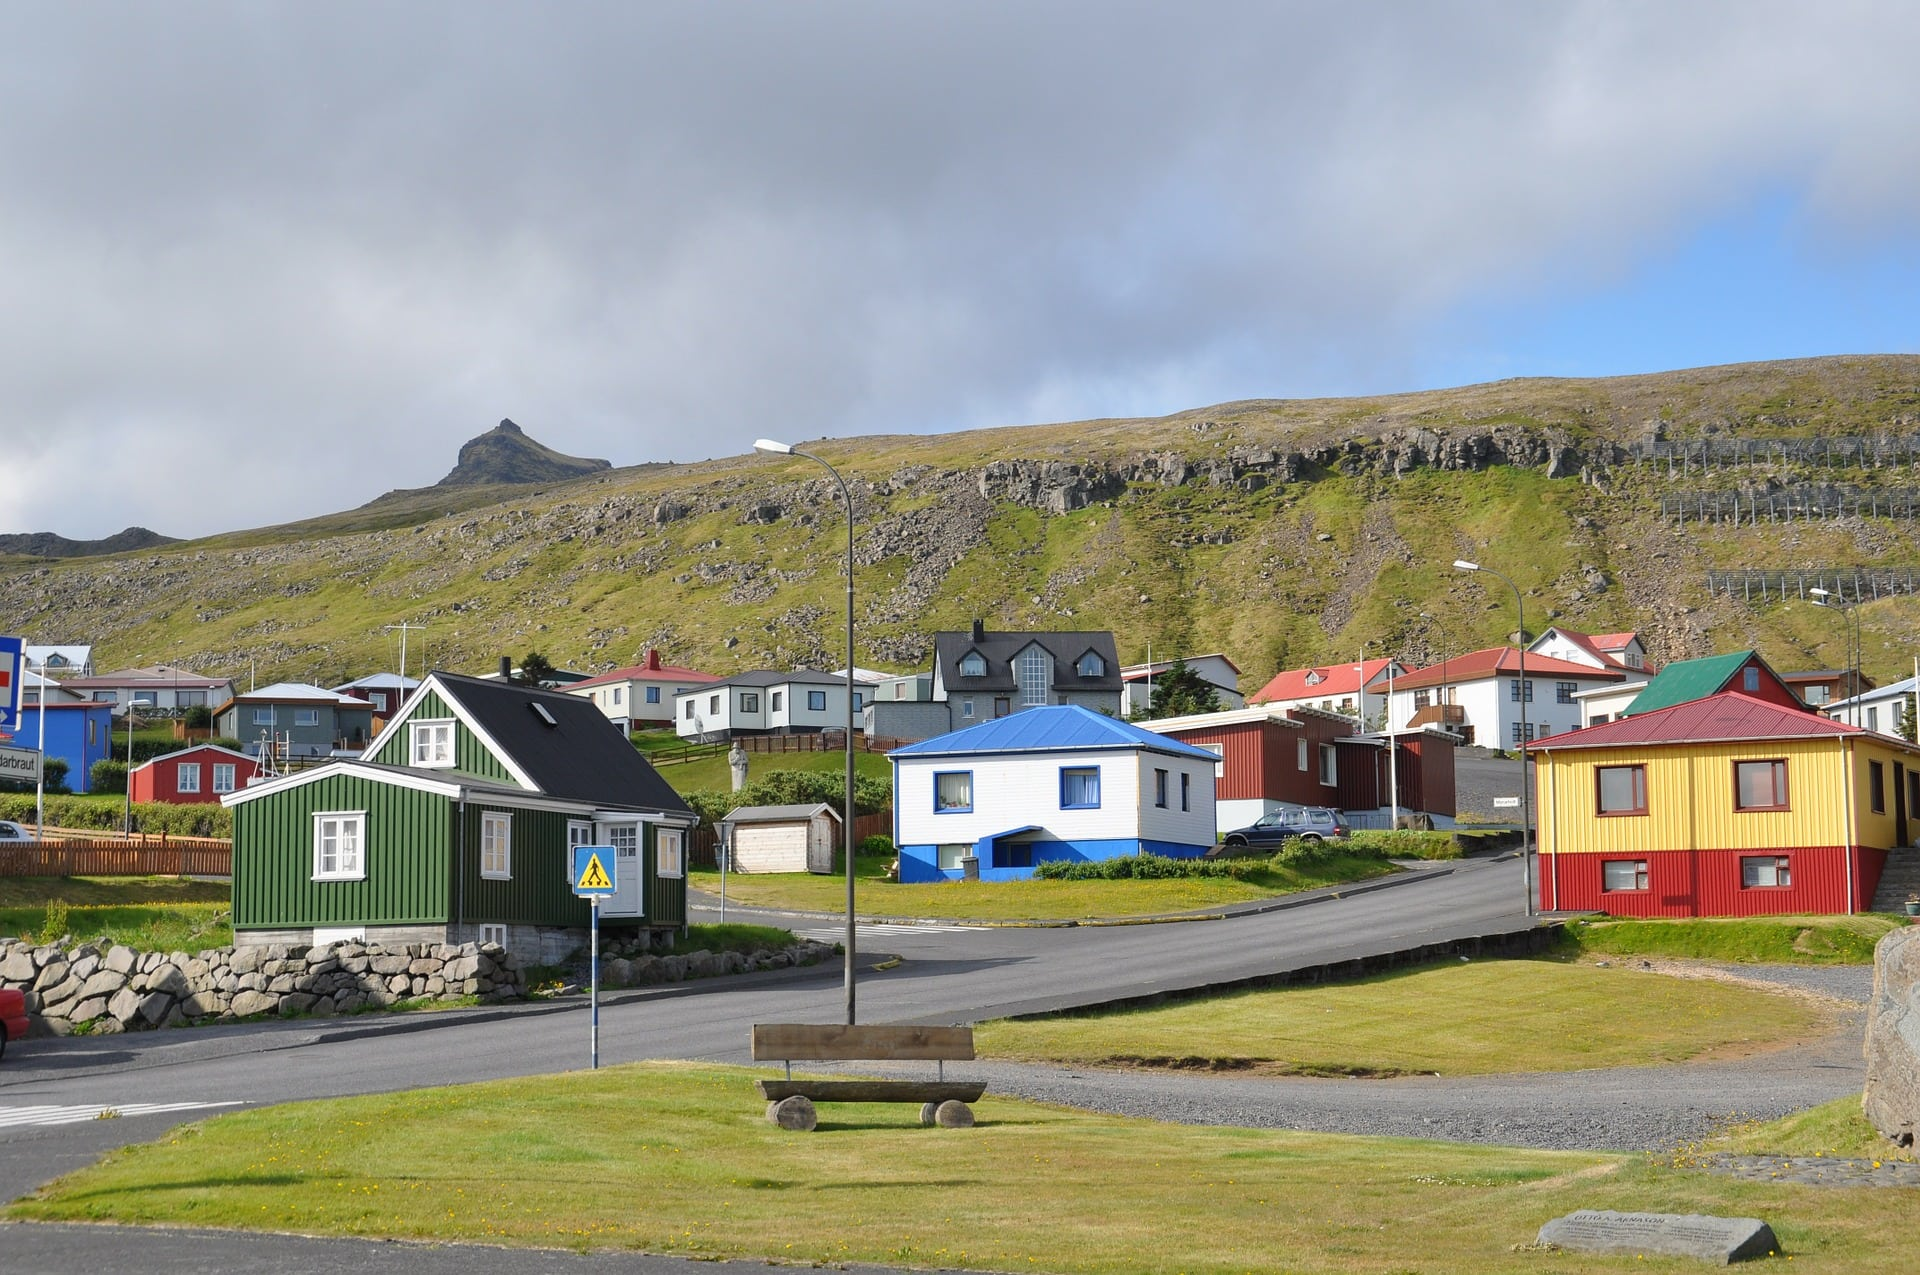 The town of Ólafsvík overlooks the Breiðafjörður fjord. It has a little more than 1000 inhabitants.